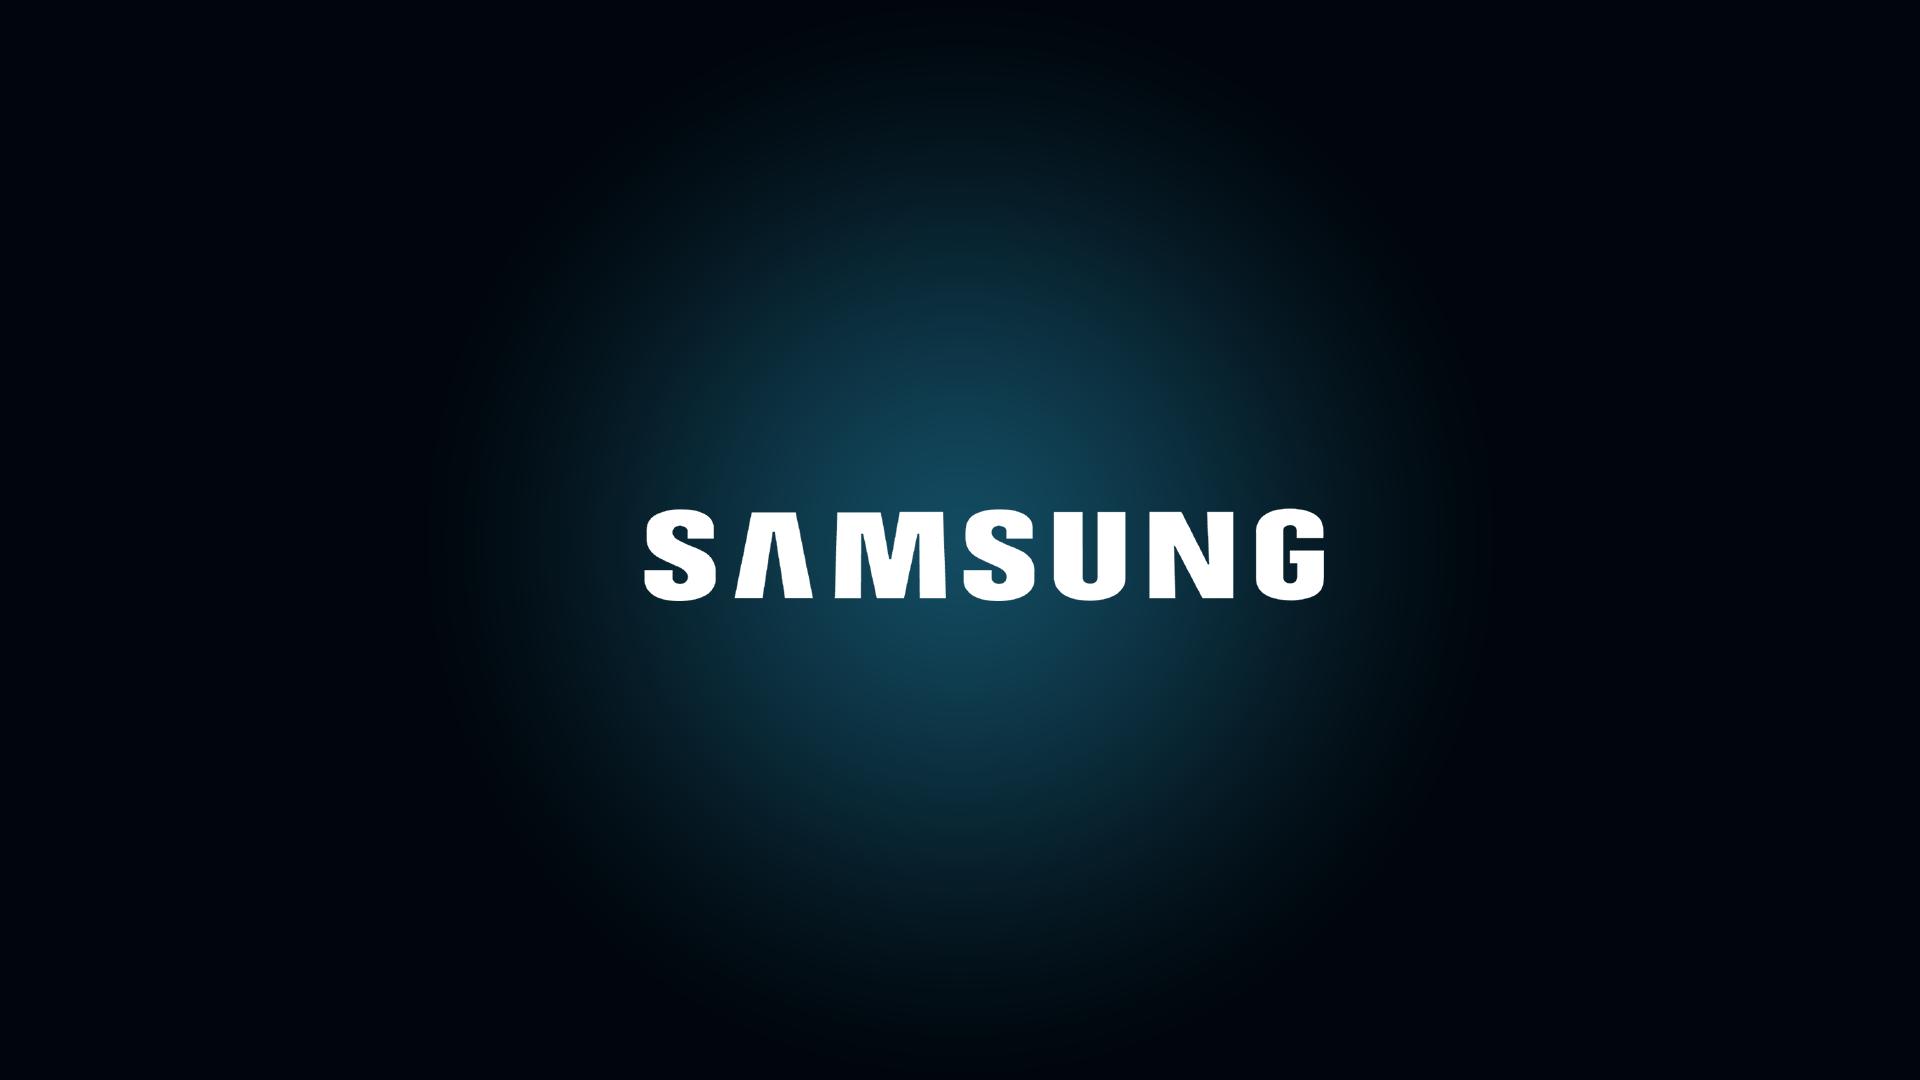 Hd wallpaper samsung - Samsung Galaxy S D Wallpapers Desktop Backgrounds Hd Pictures